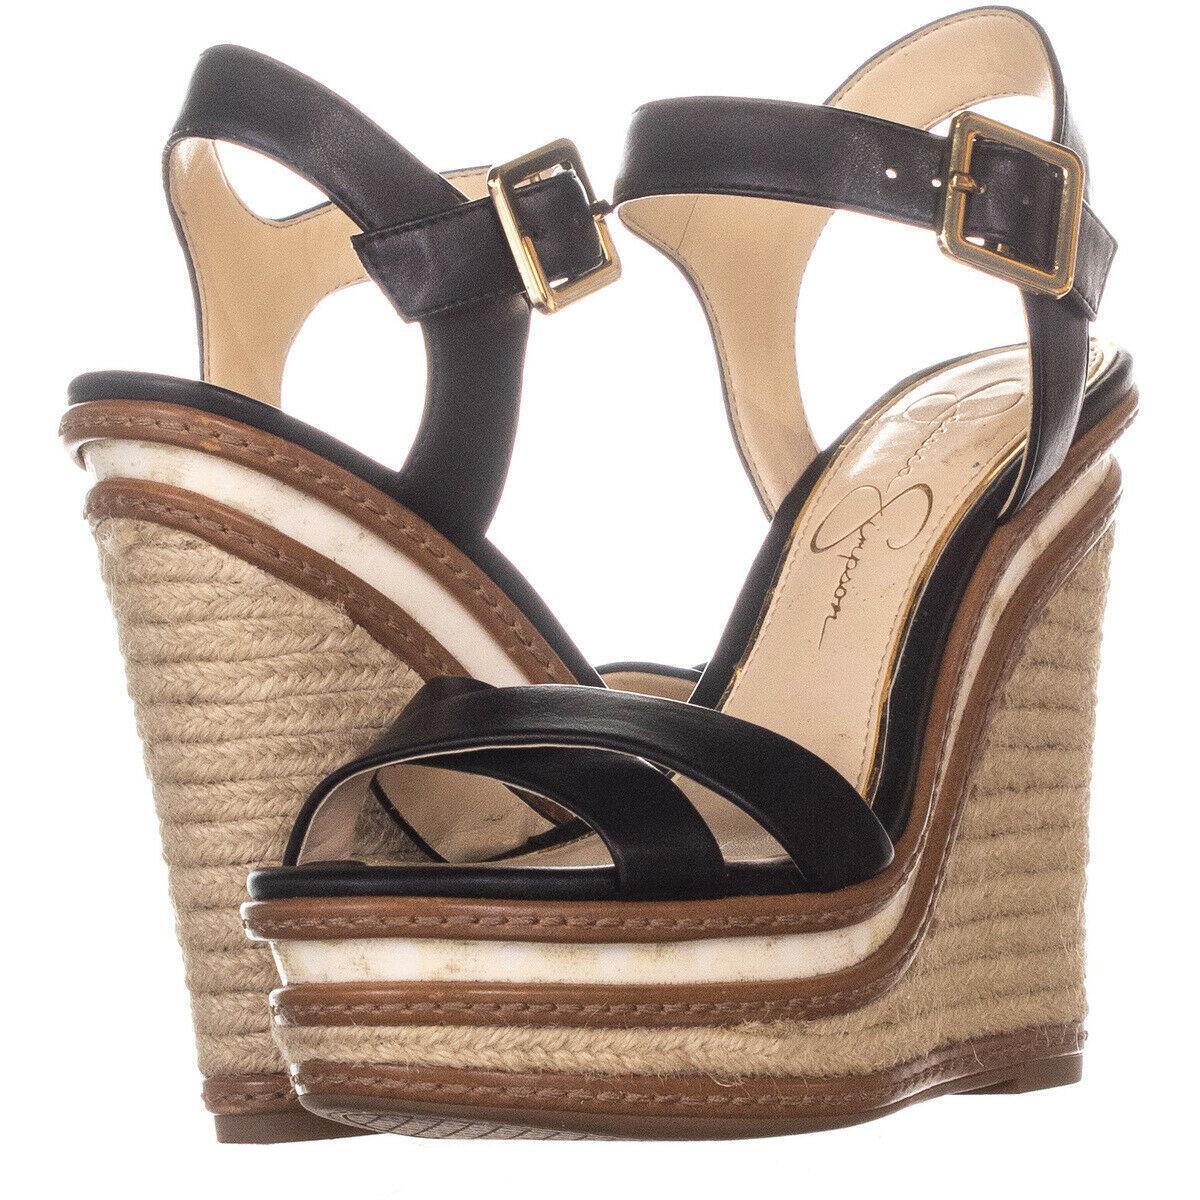 Jessica Simpson Aeralin Wedge Slingback Sandals 822 Black